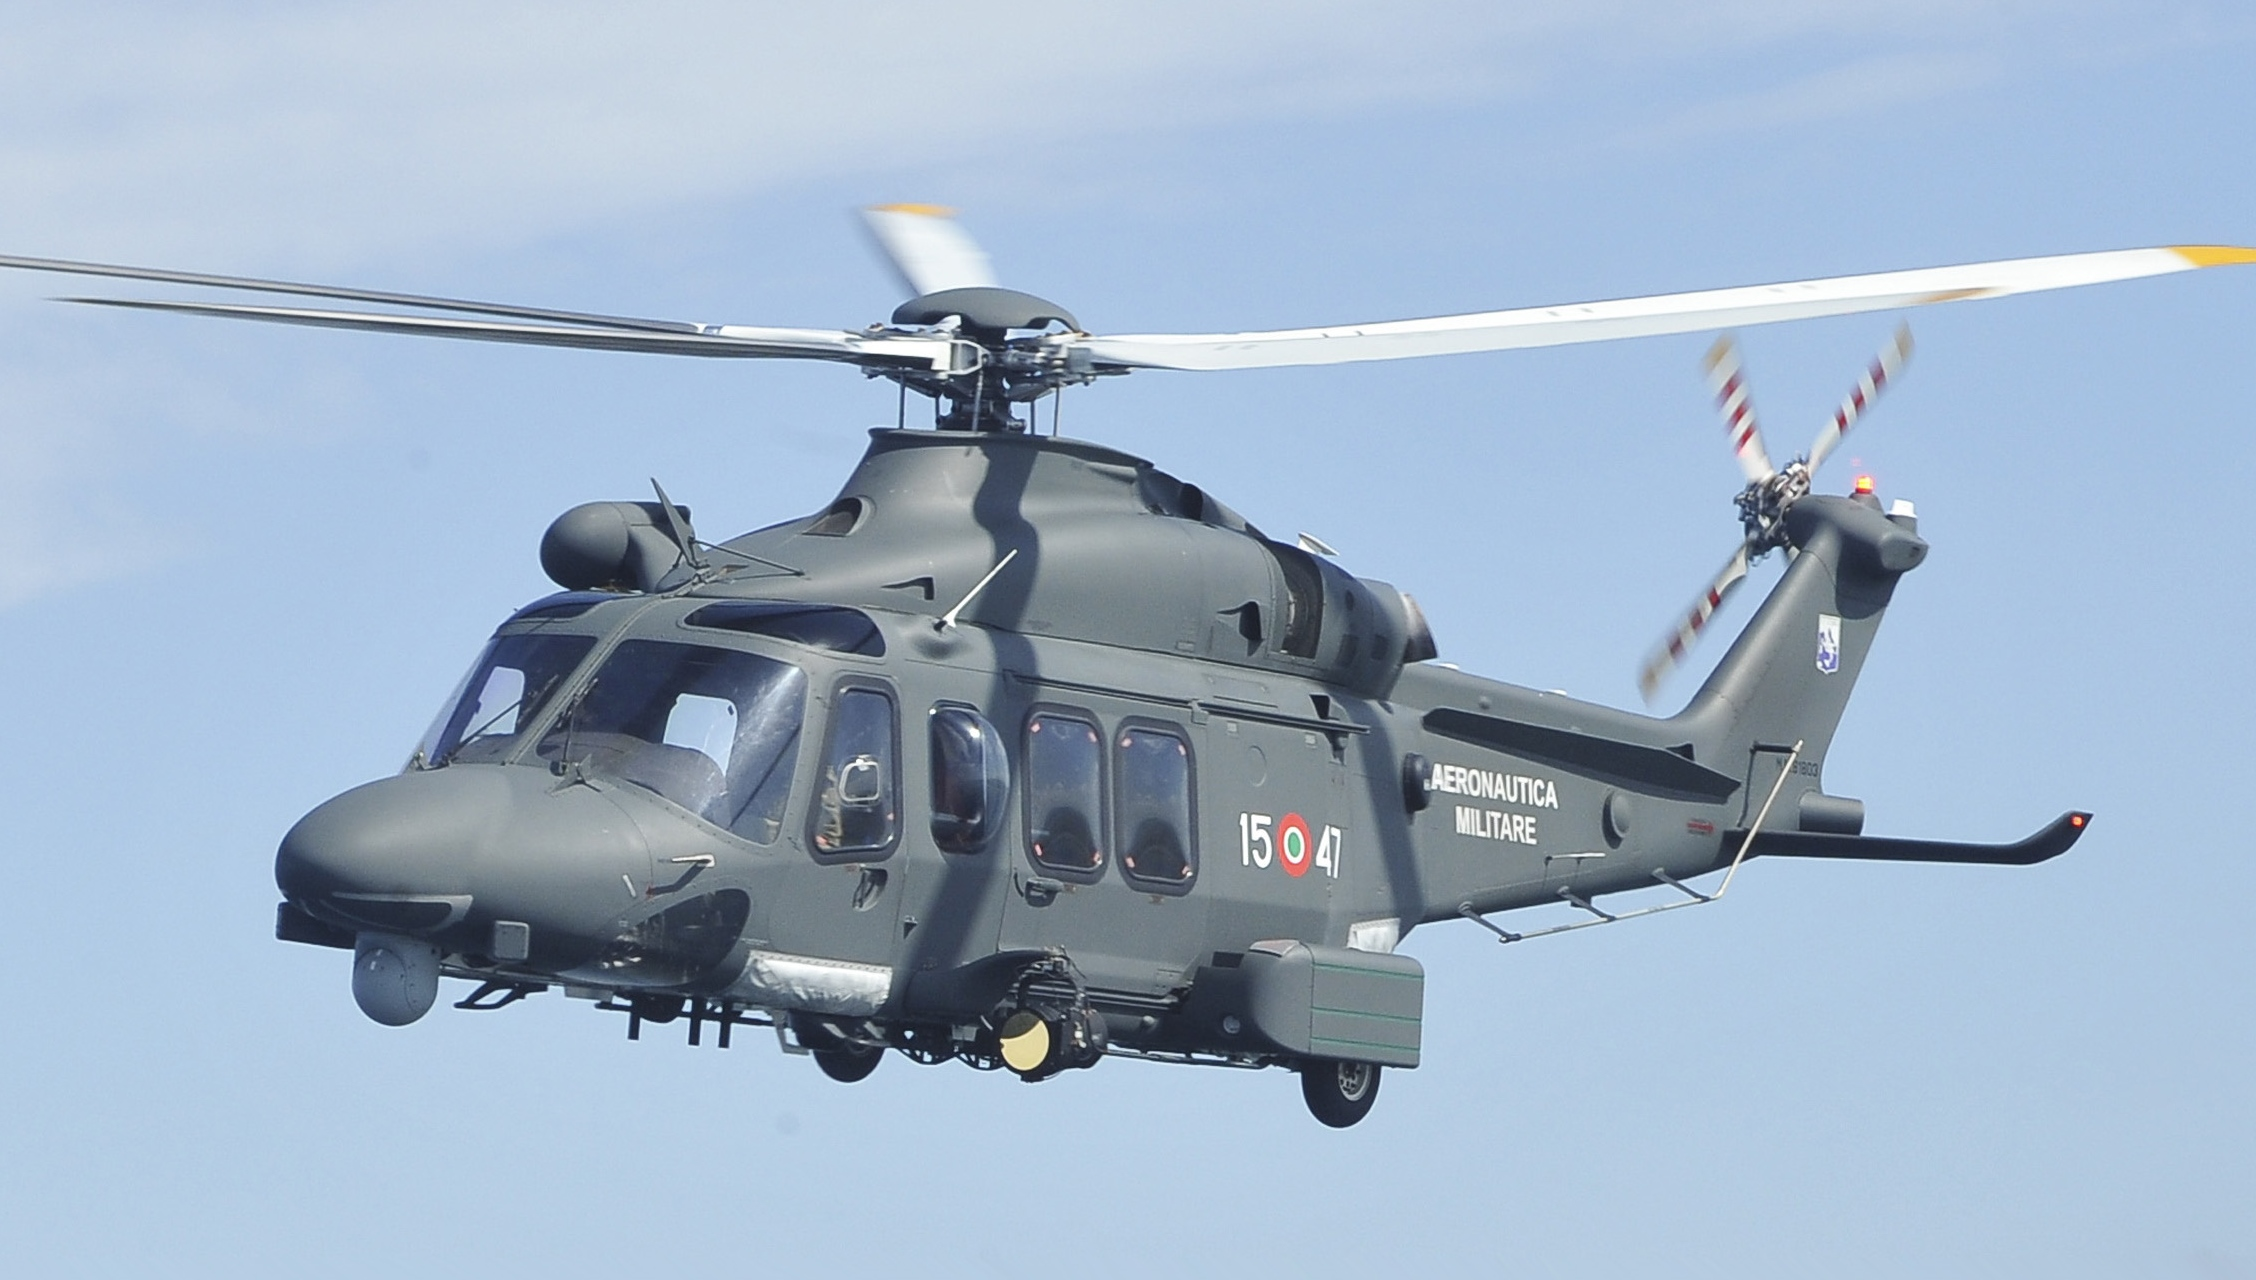 AgustaWestland AW139 - Wikipedia